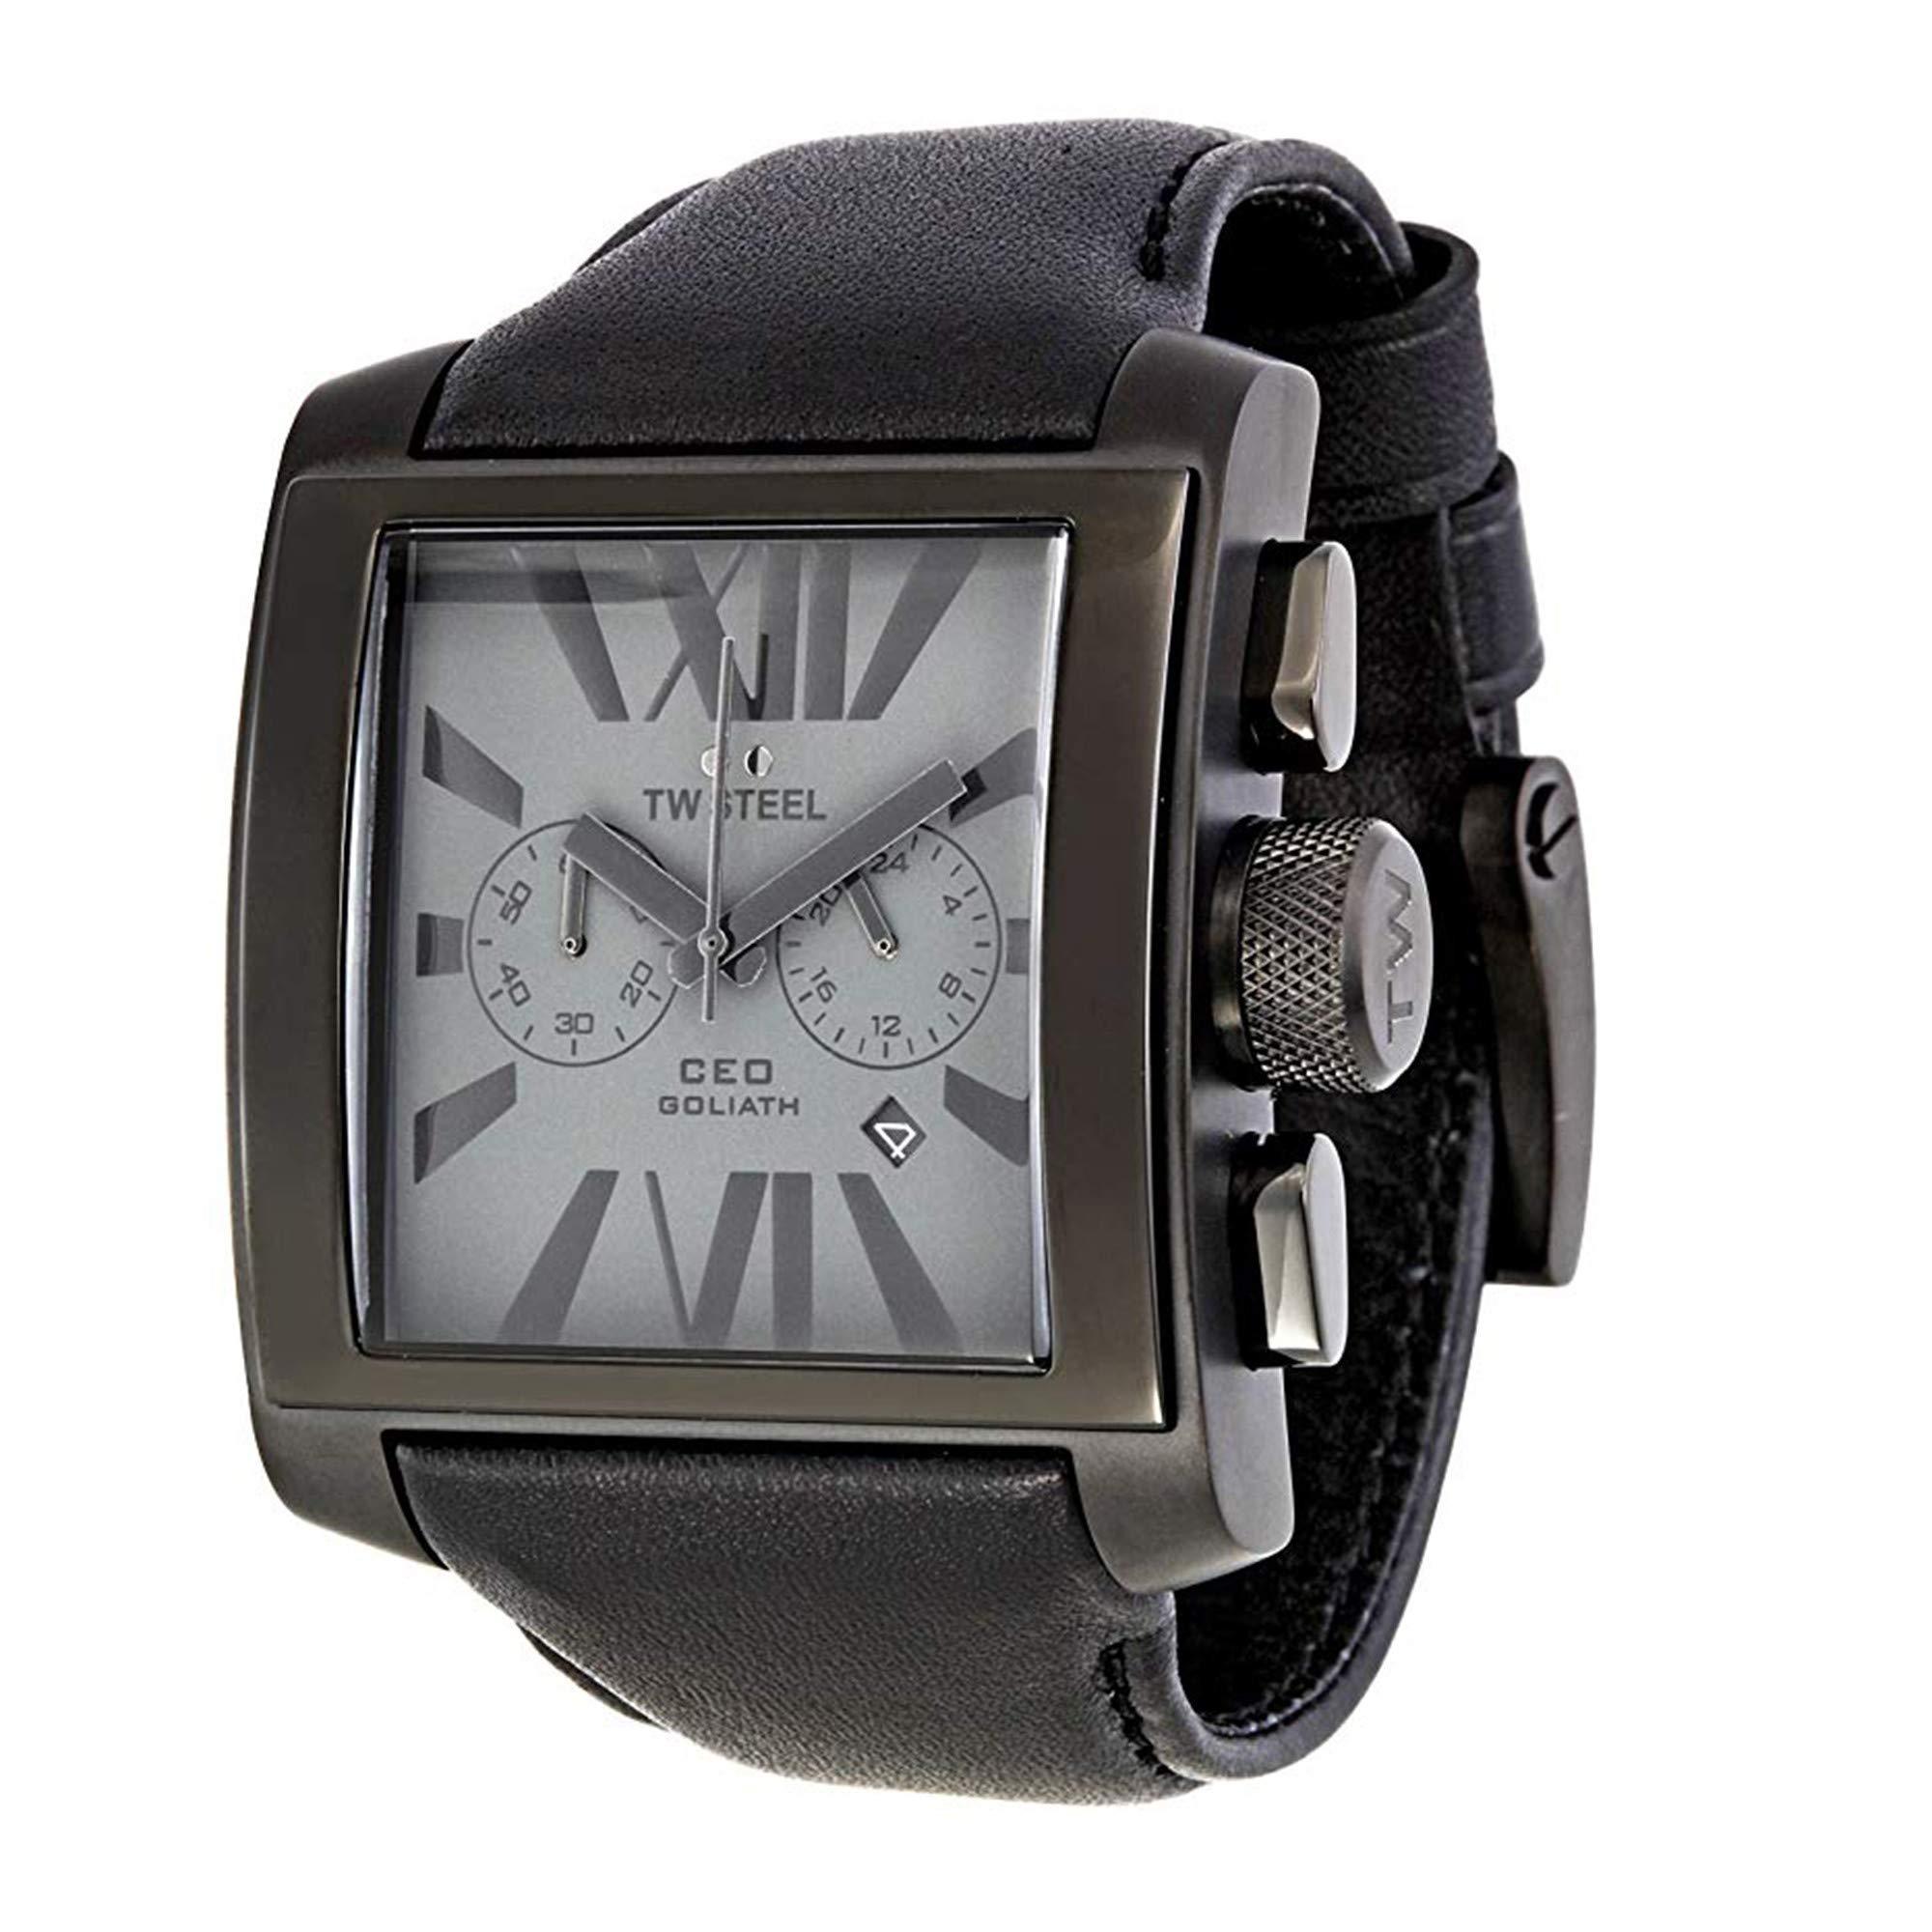 TW Steel CEO Quartz Male Watch CE3014 (Certified Pre-Owned)